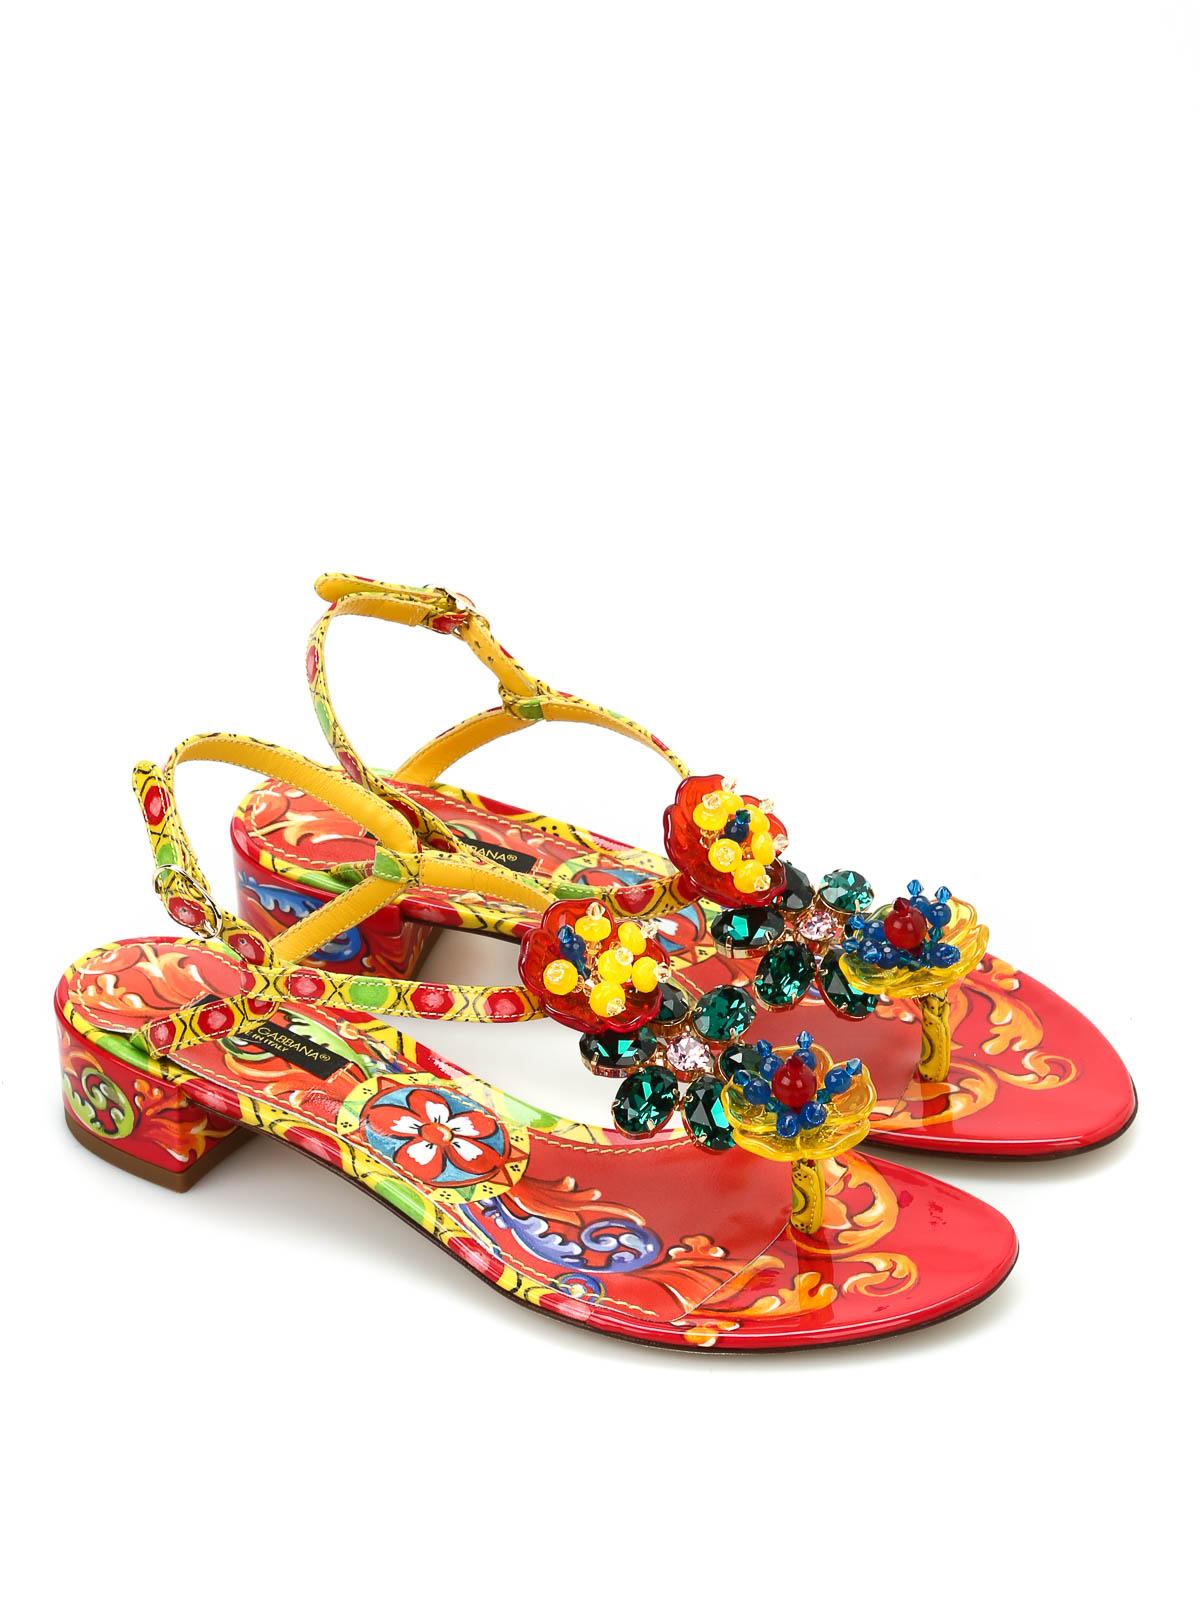 bb4f459fb Dolce   Gabbana - Leather sandals with rhinestones - sandals ...